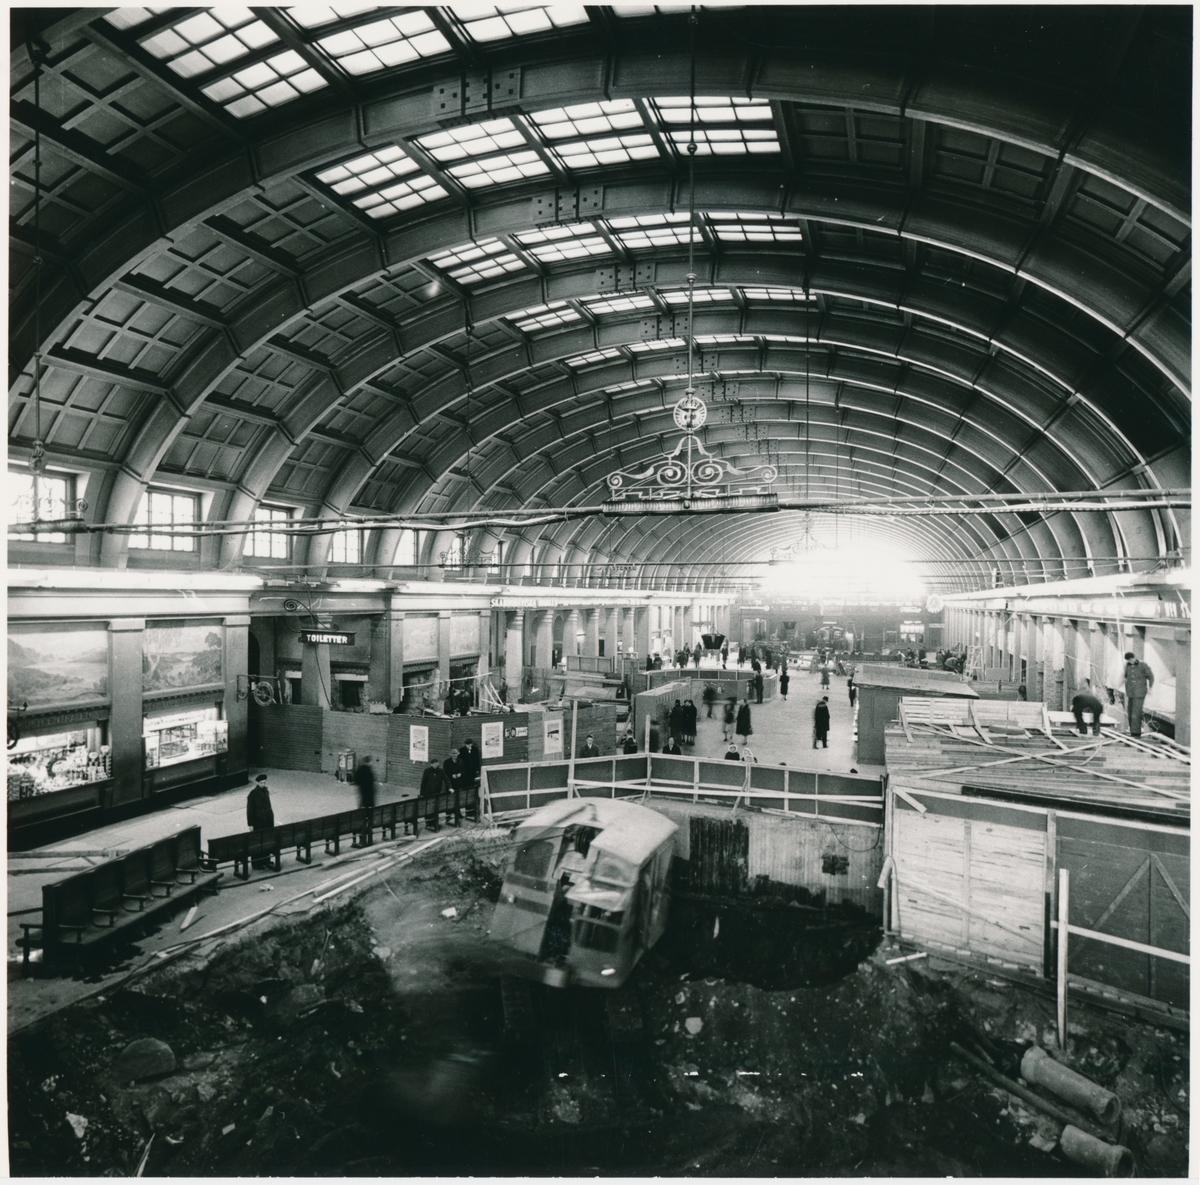 Ombyggnation inne på Stockholms Centralstation.